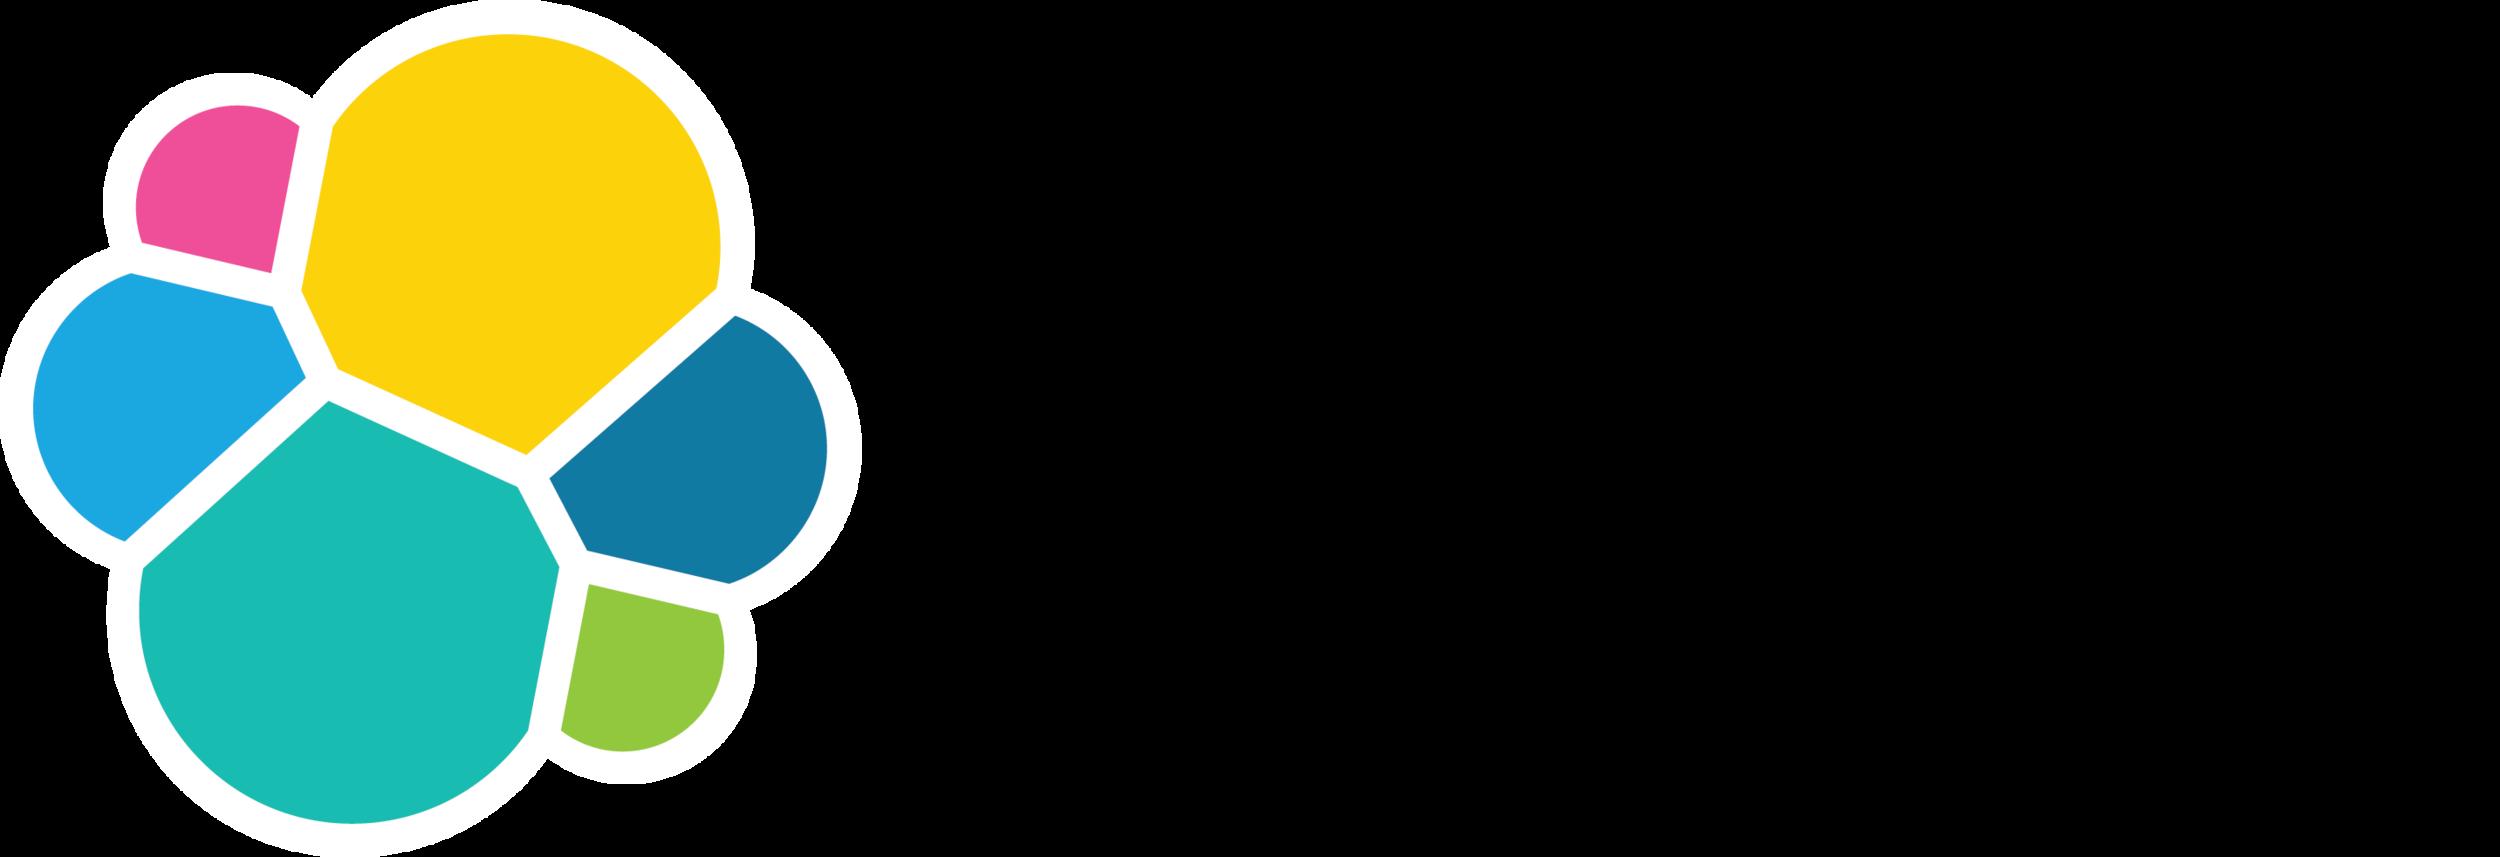 elastic-logo-H-full color.png